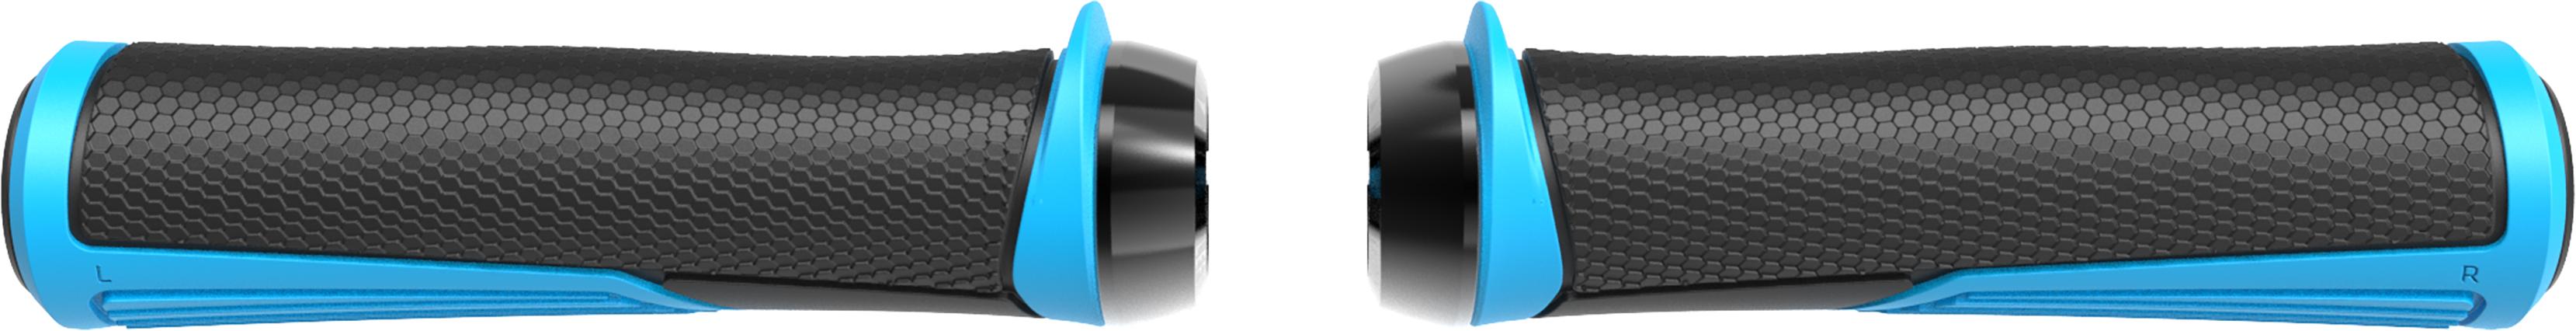 Грипсы BBB Cobra 142mm / blue / lockring light copper синий, Рулевая группа - арт. 1022150362